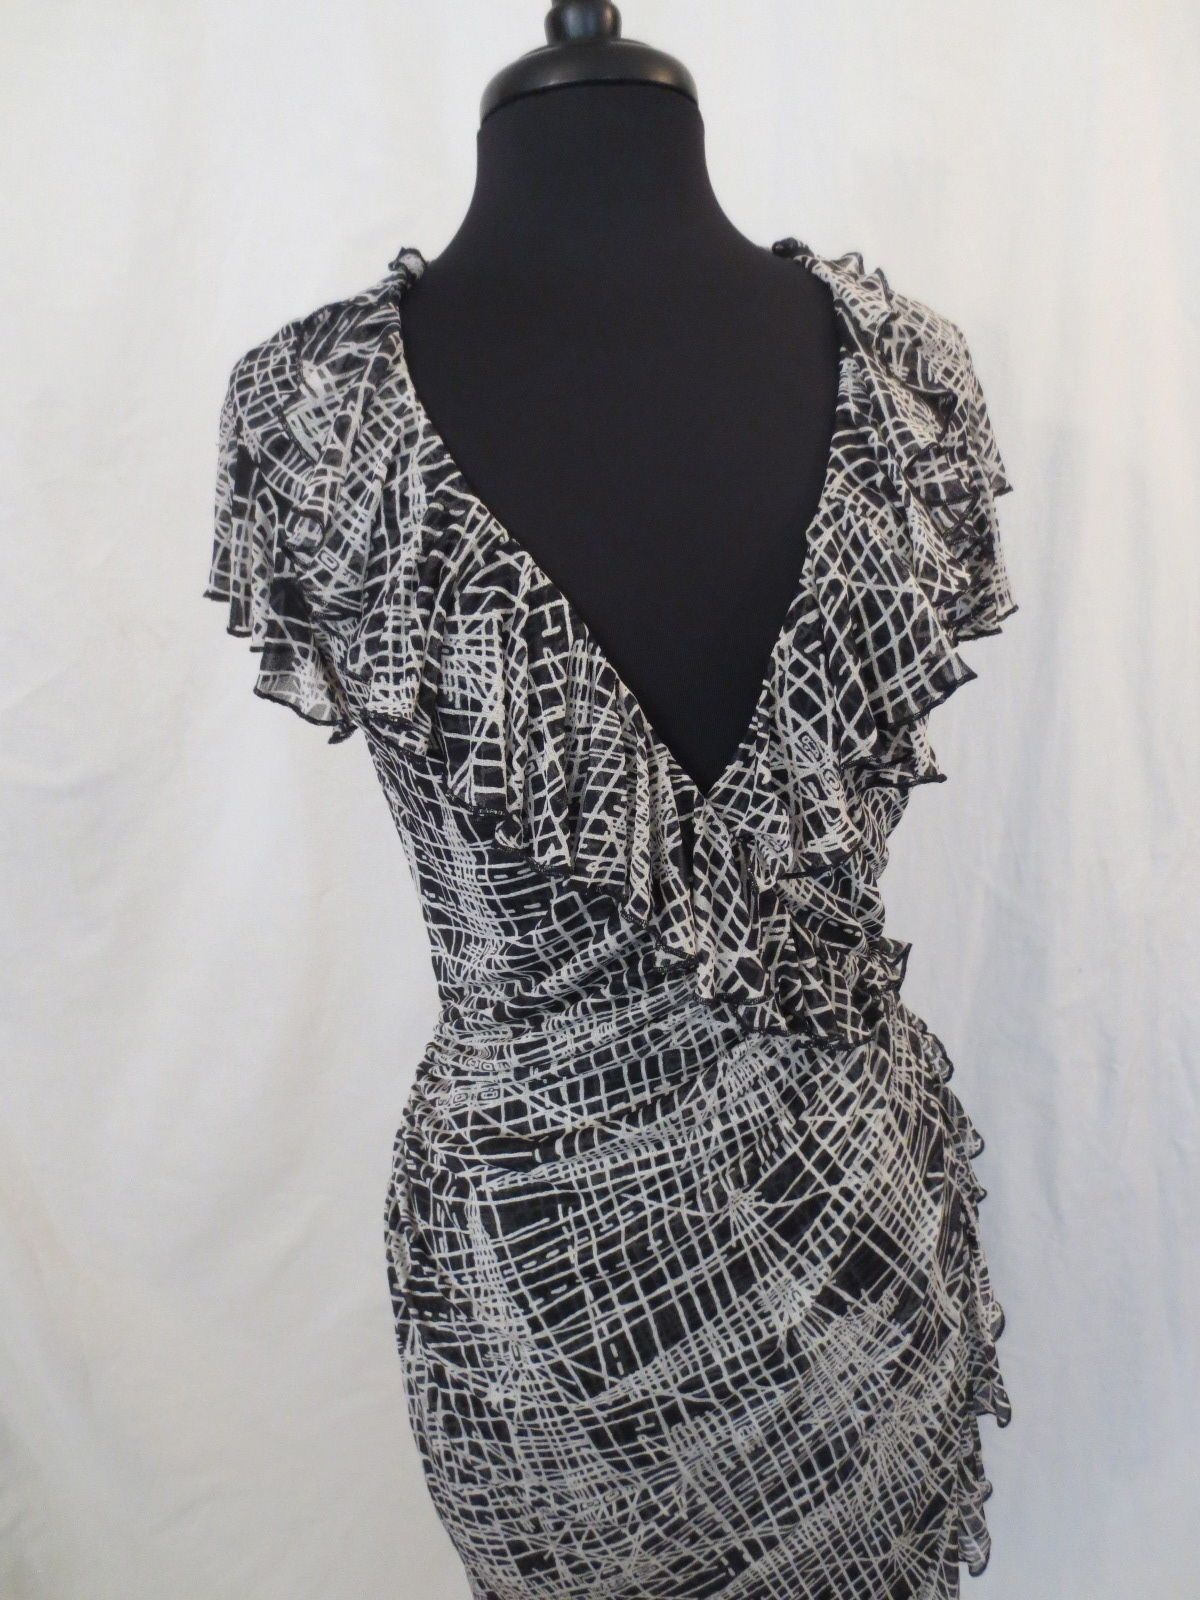 DIANE VON FURSTENBERG Paulette dress - $29.99 at JOHNNY BOMBSHELL #dvf #silk #wiggledress